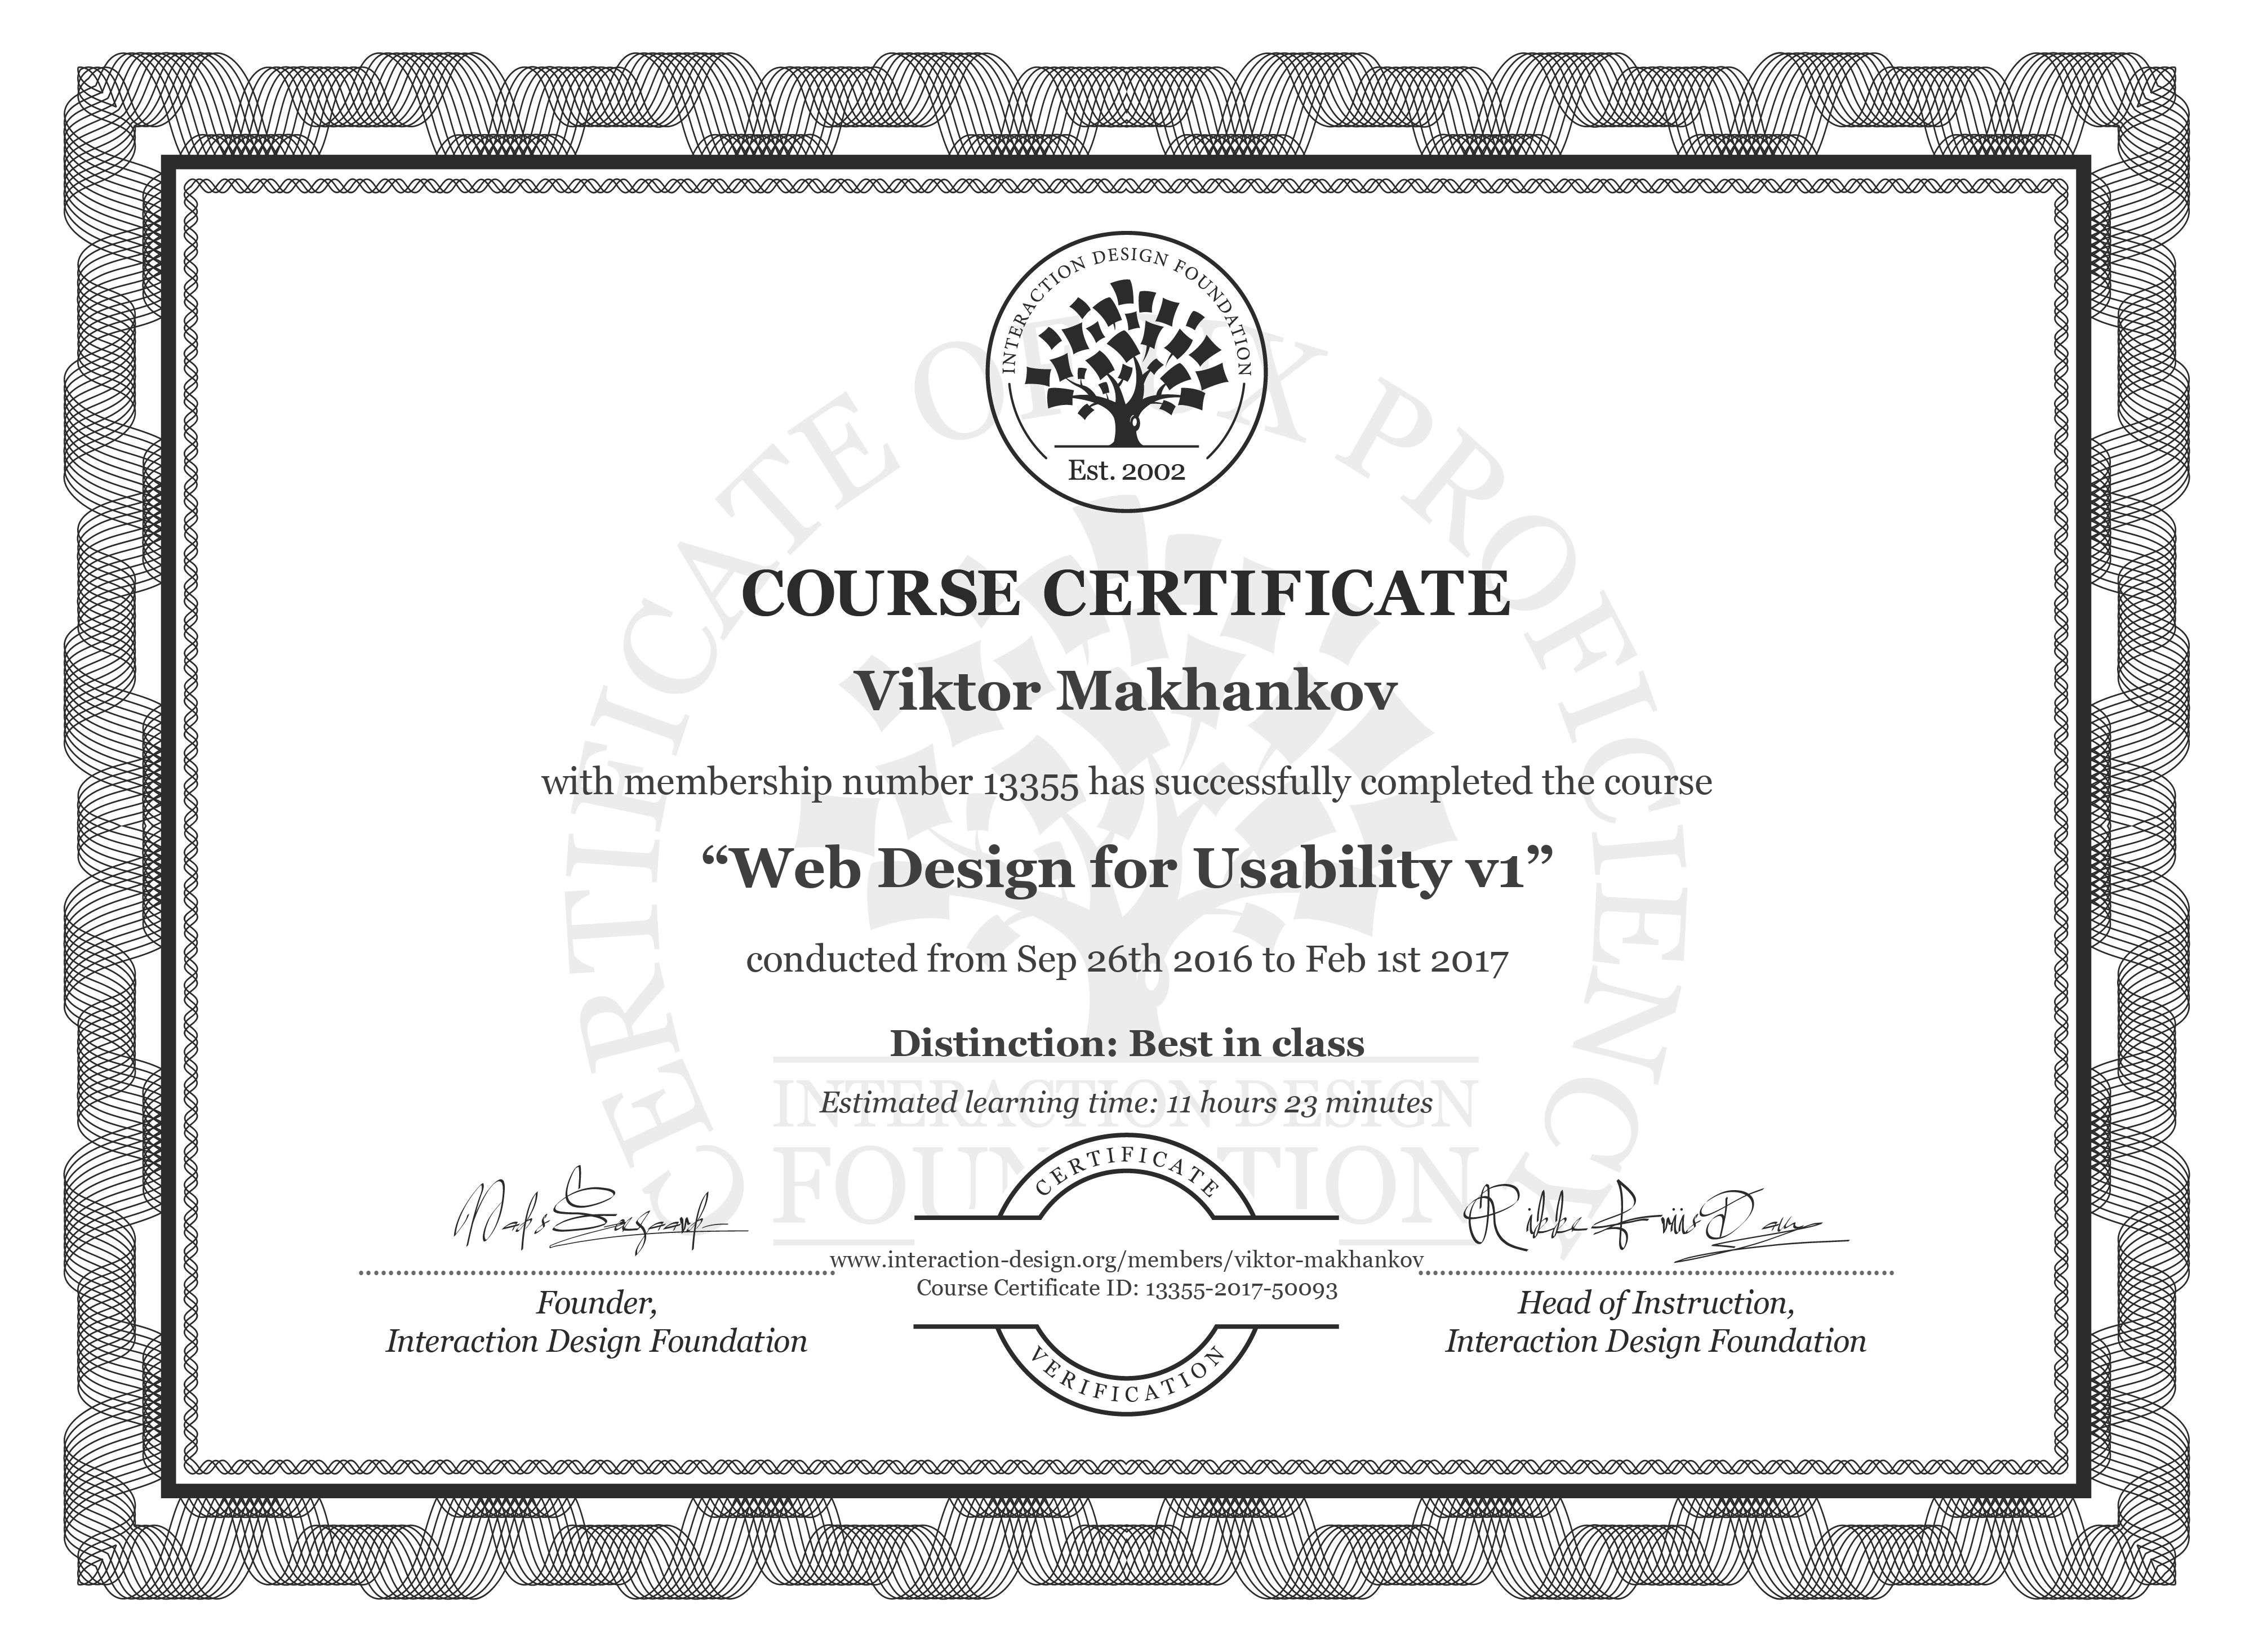 Viktor Makhankov's Course Certificate: Web Design for Usability